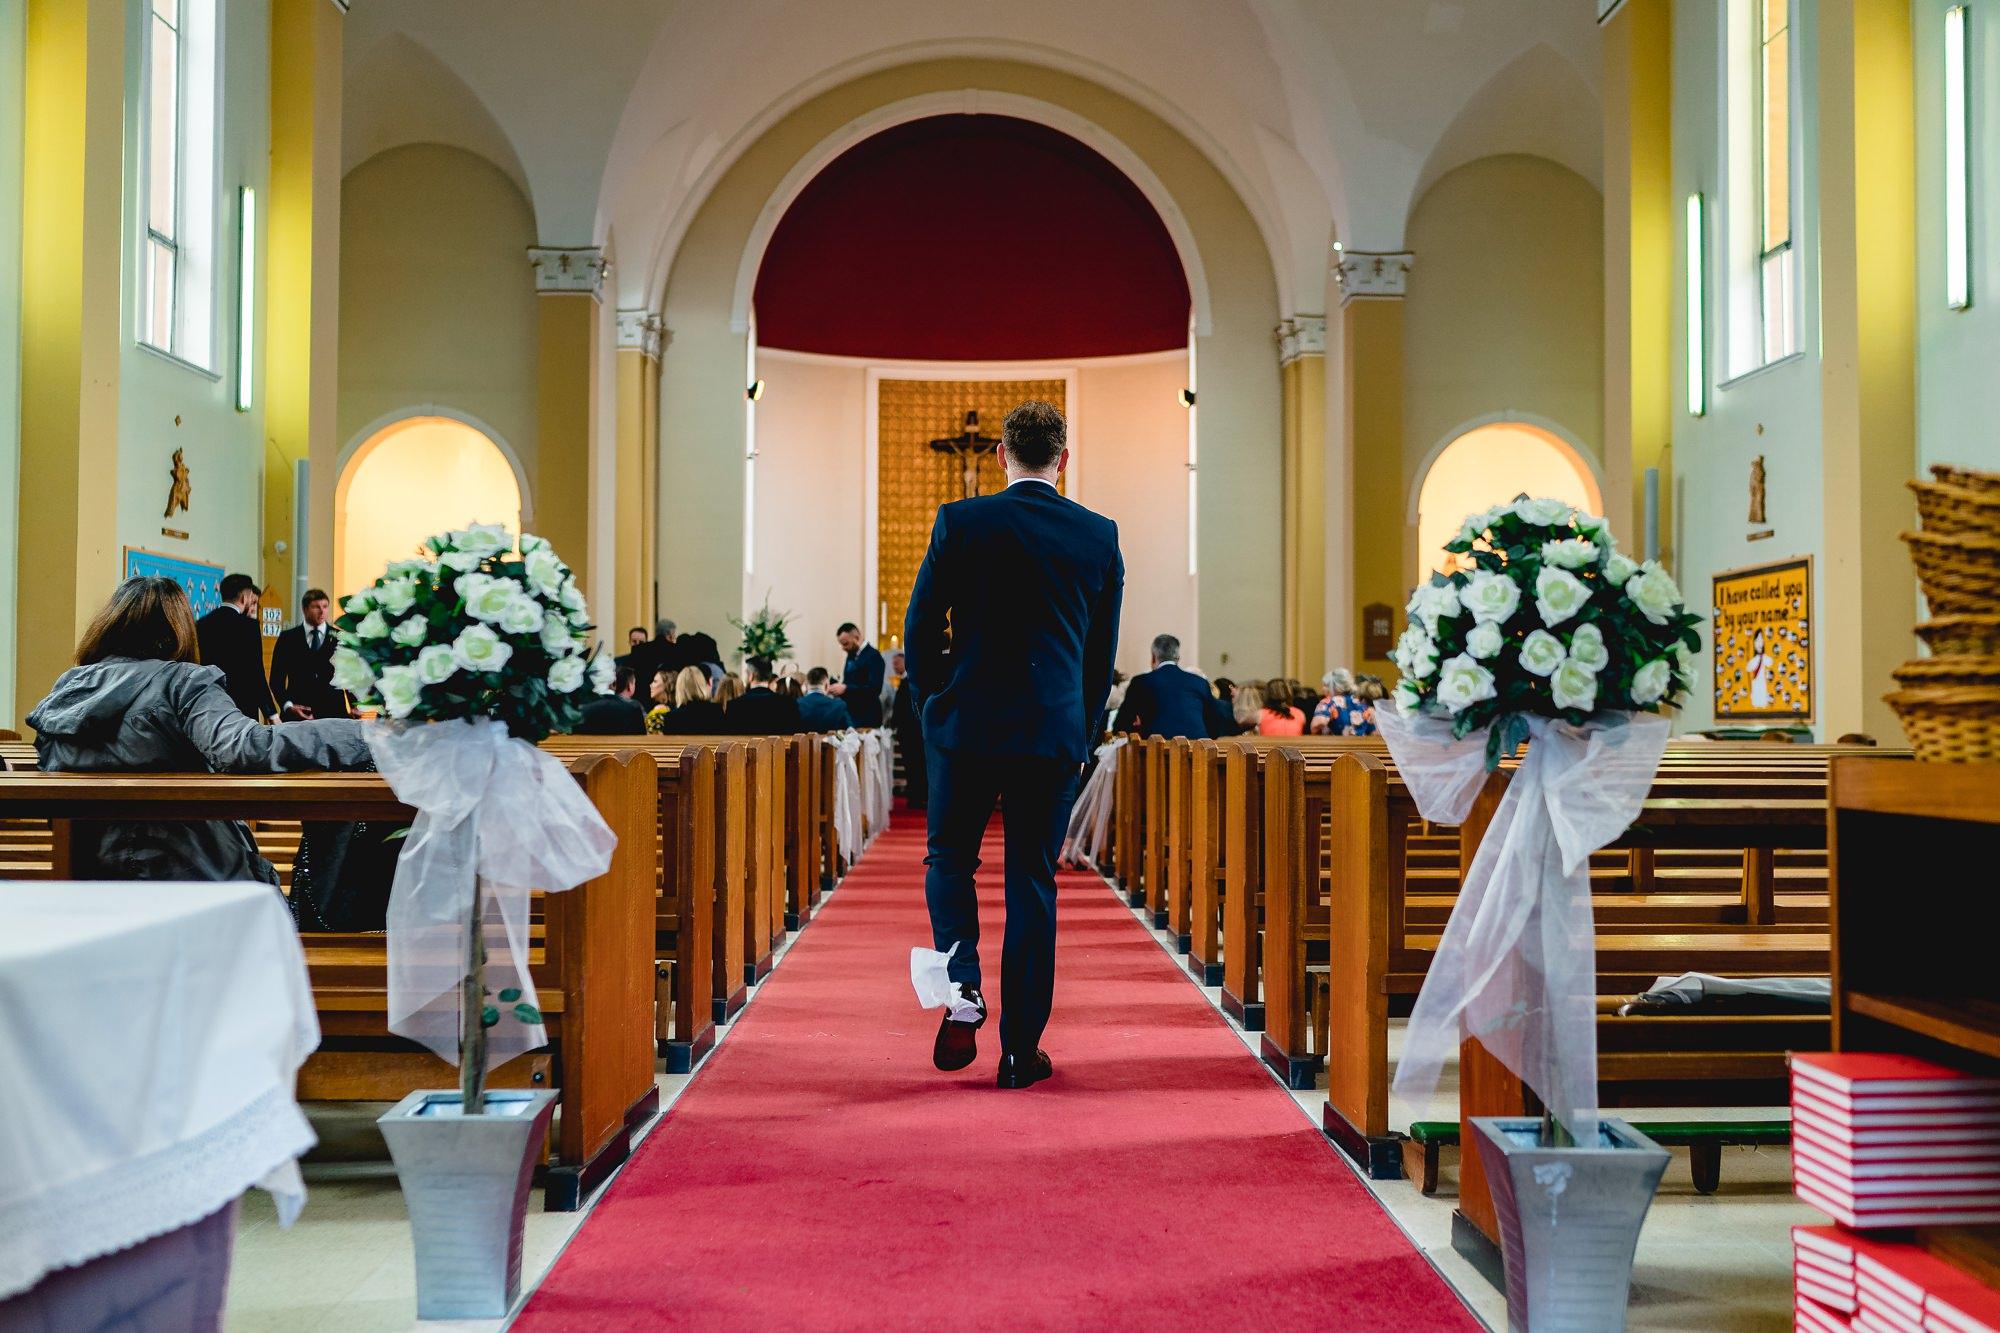 The-Castlefield-Rooms-Wedding-Photographer_0006.jpg